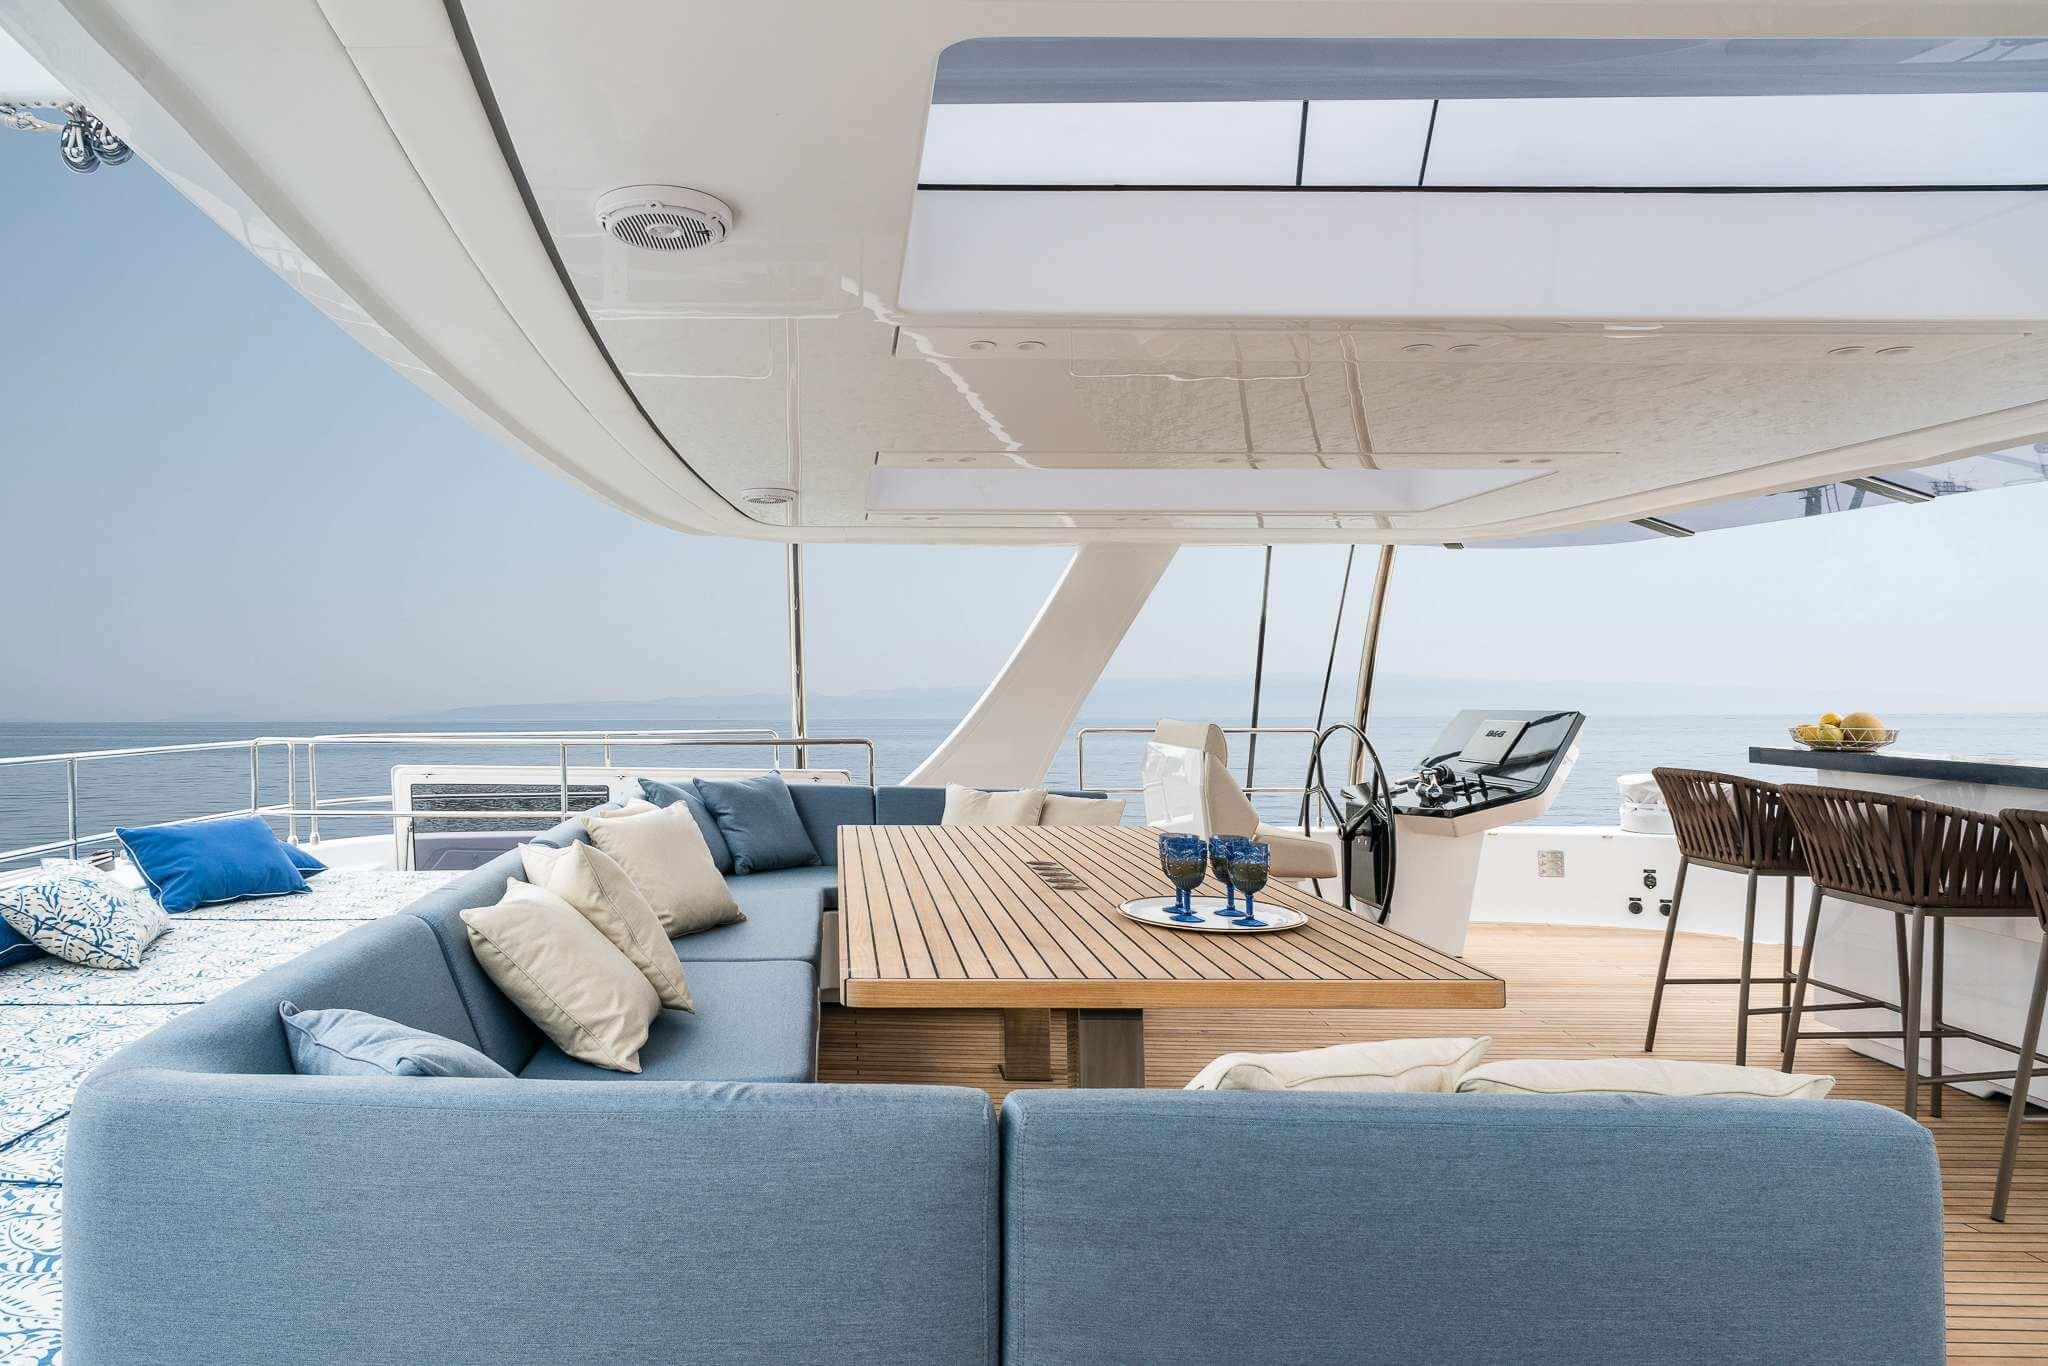 Genny Sunreef Catamaran 15